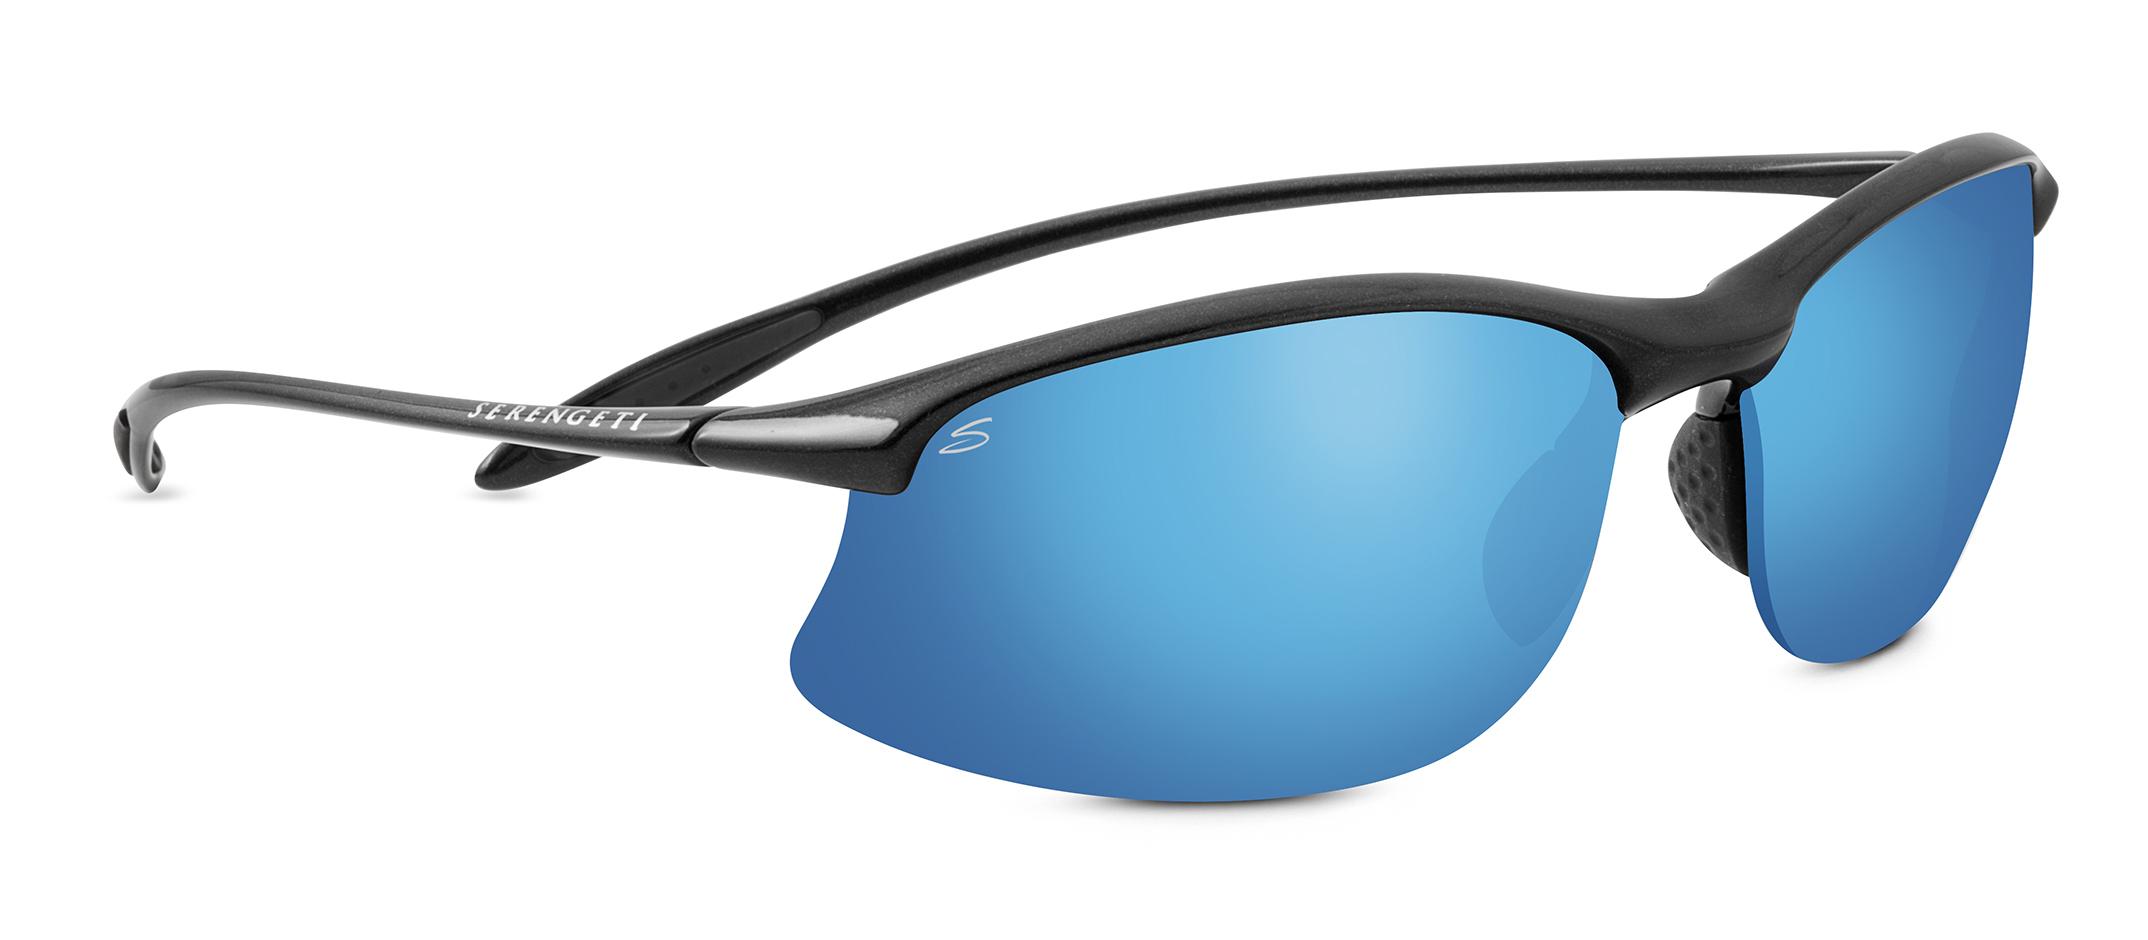 ffe99e5f72e Serengeti Maestrale Sunglasses AUTHENTIC ON SALE Serengeti PhD-7356 ...